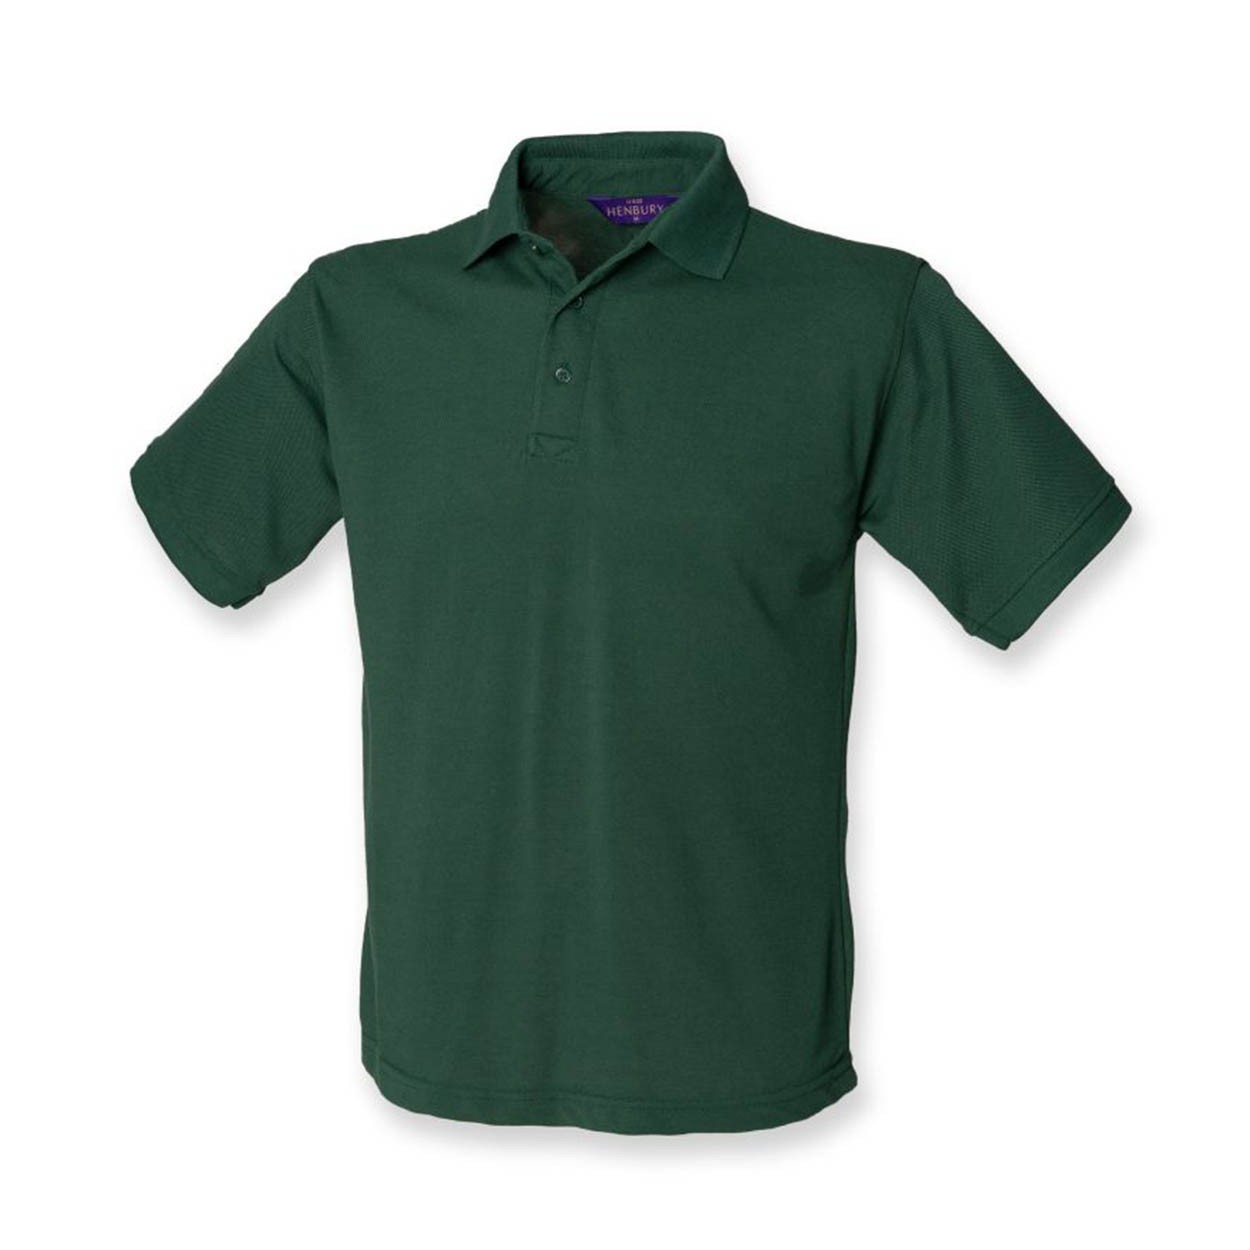 Henbury Herren Poloshirt CLASSIC COTTON PIQUE POLO XS S M L XL XXL 3XL Neu H100